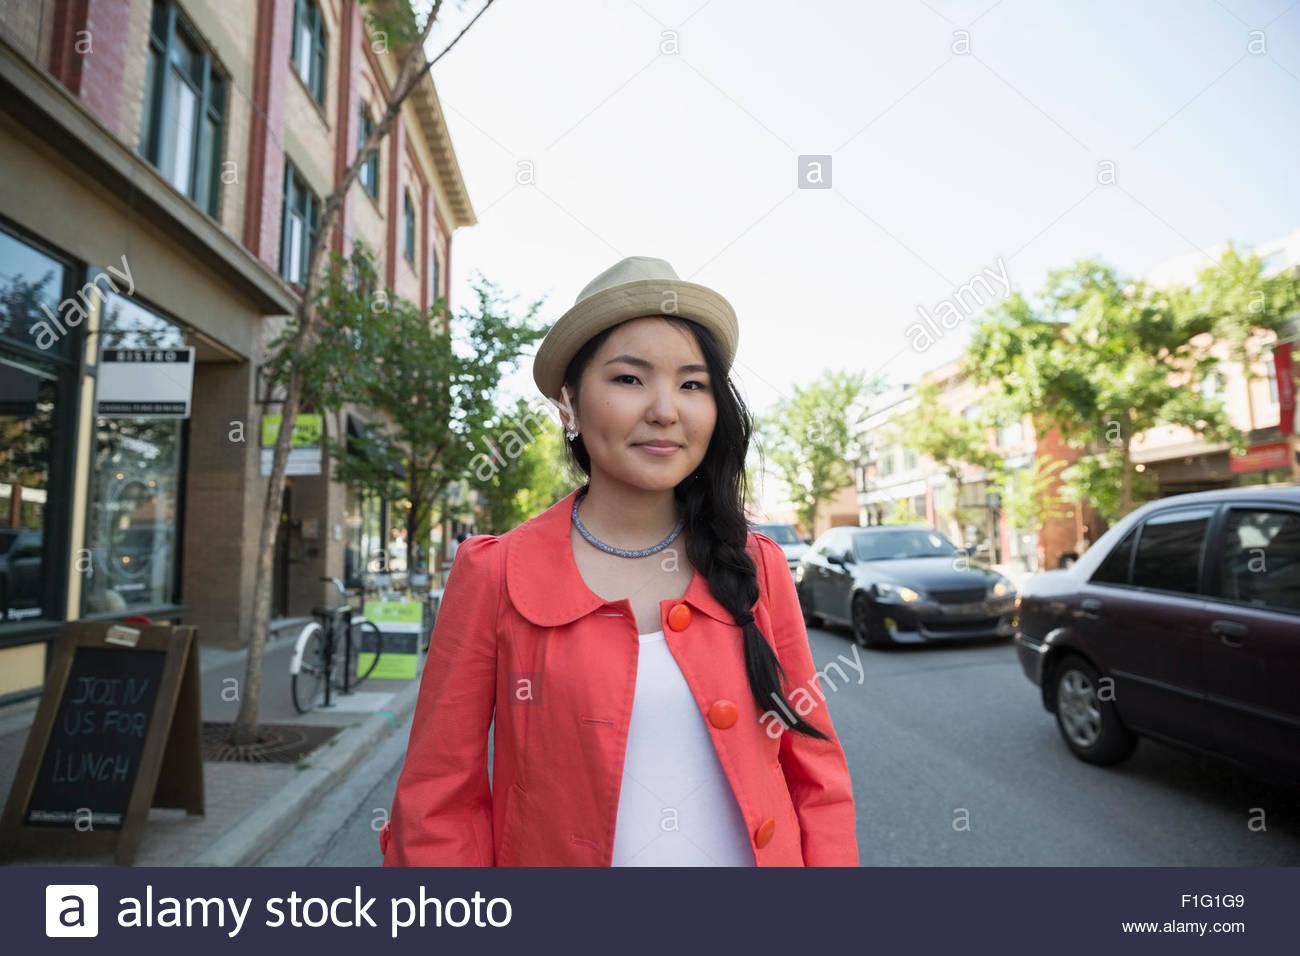 Portrait smiling woman wearing hat on urban sidewalk - Stock Image